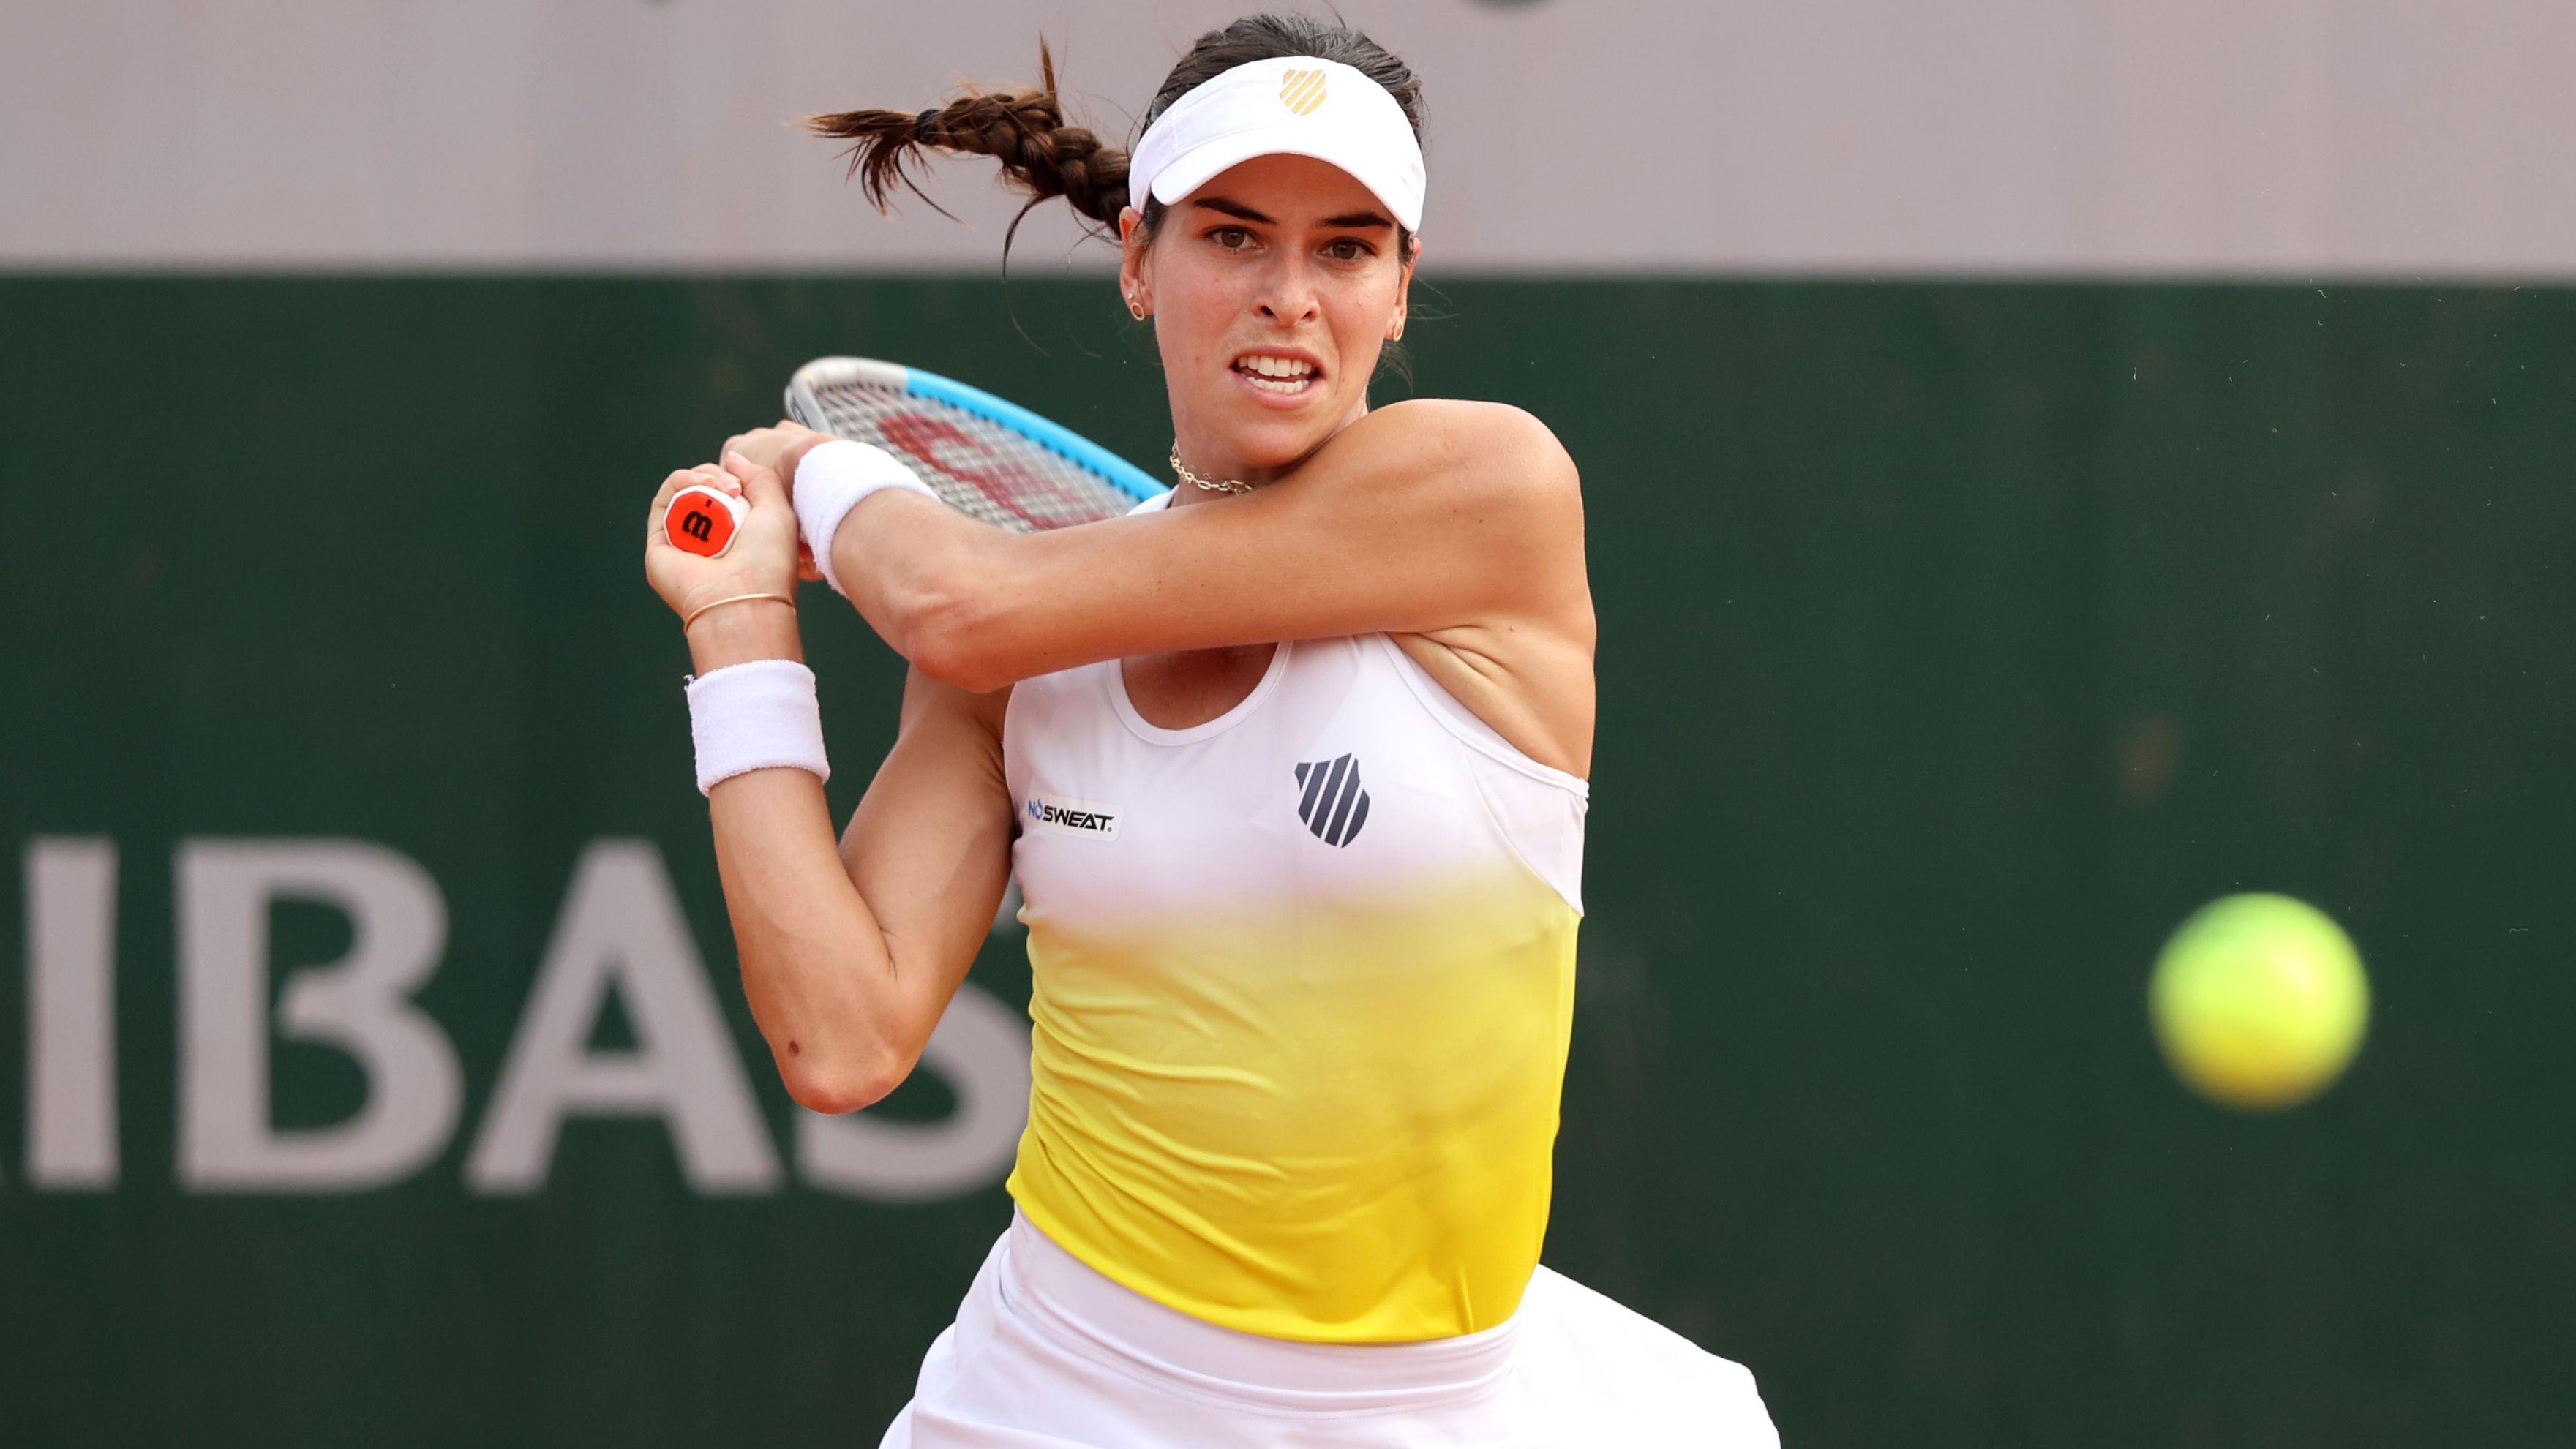 Australia's Alja Tomljanovic eliminated in second round at Roland Garros